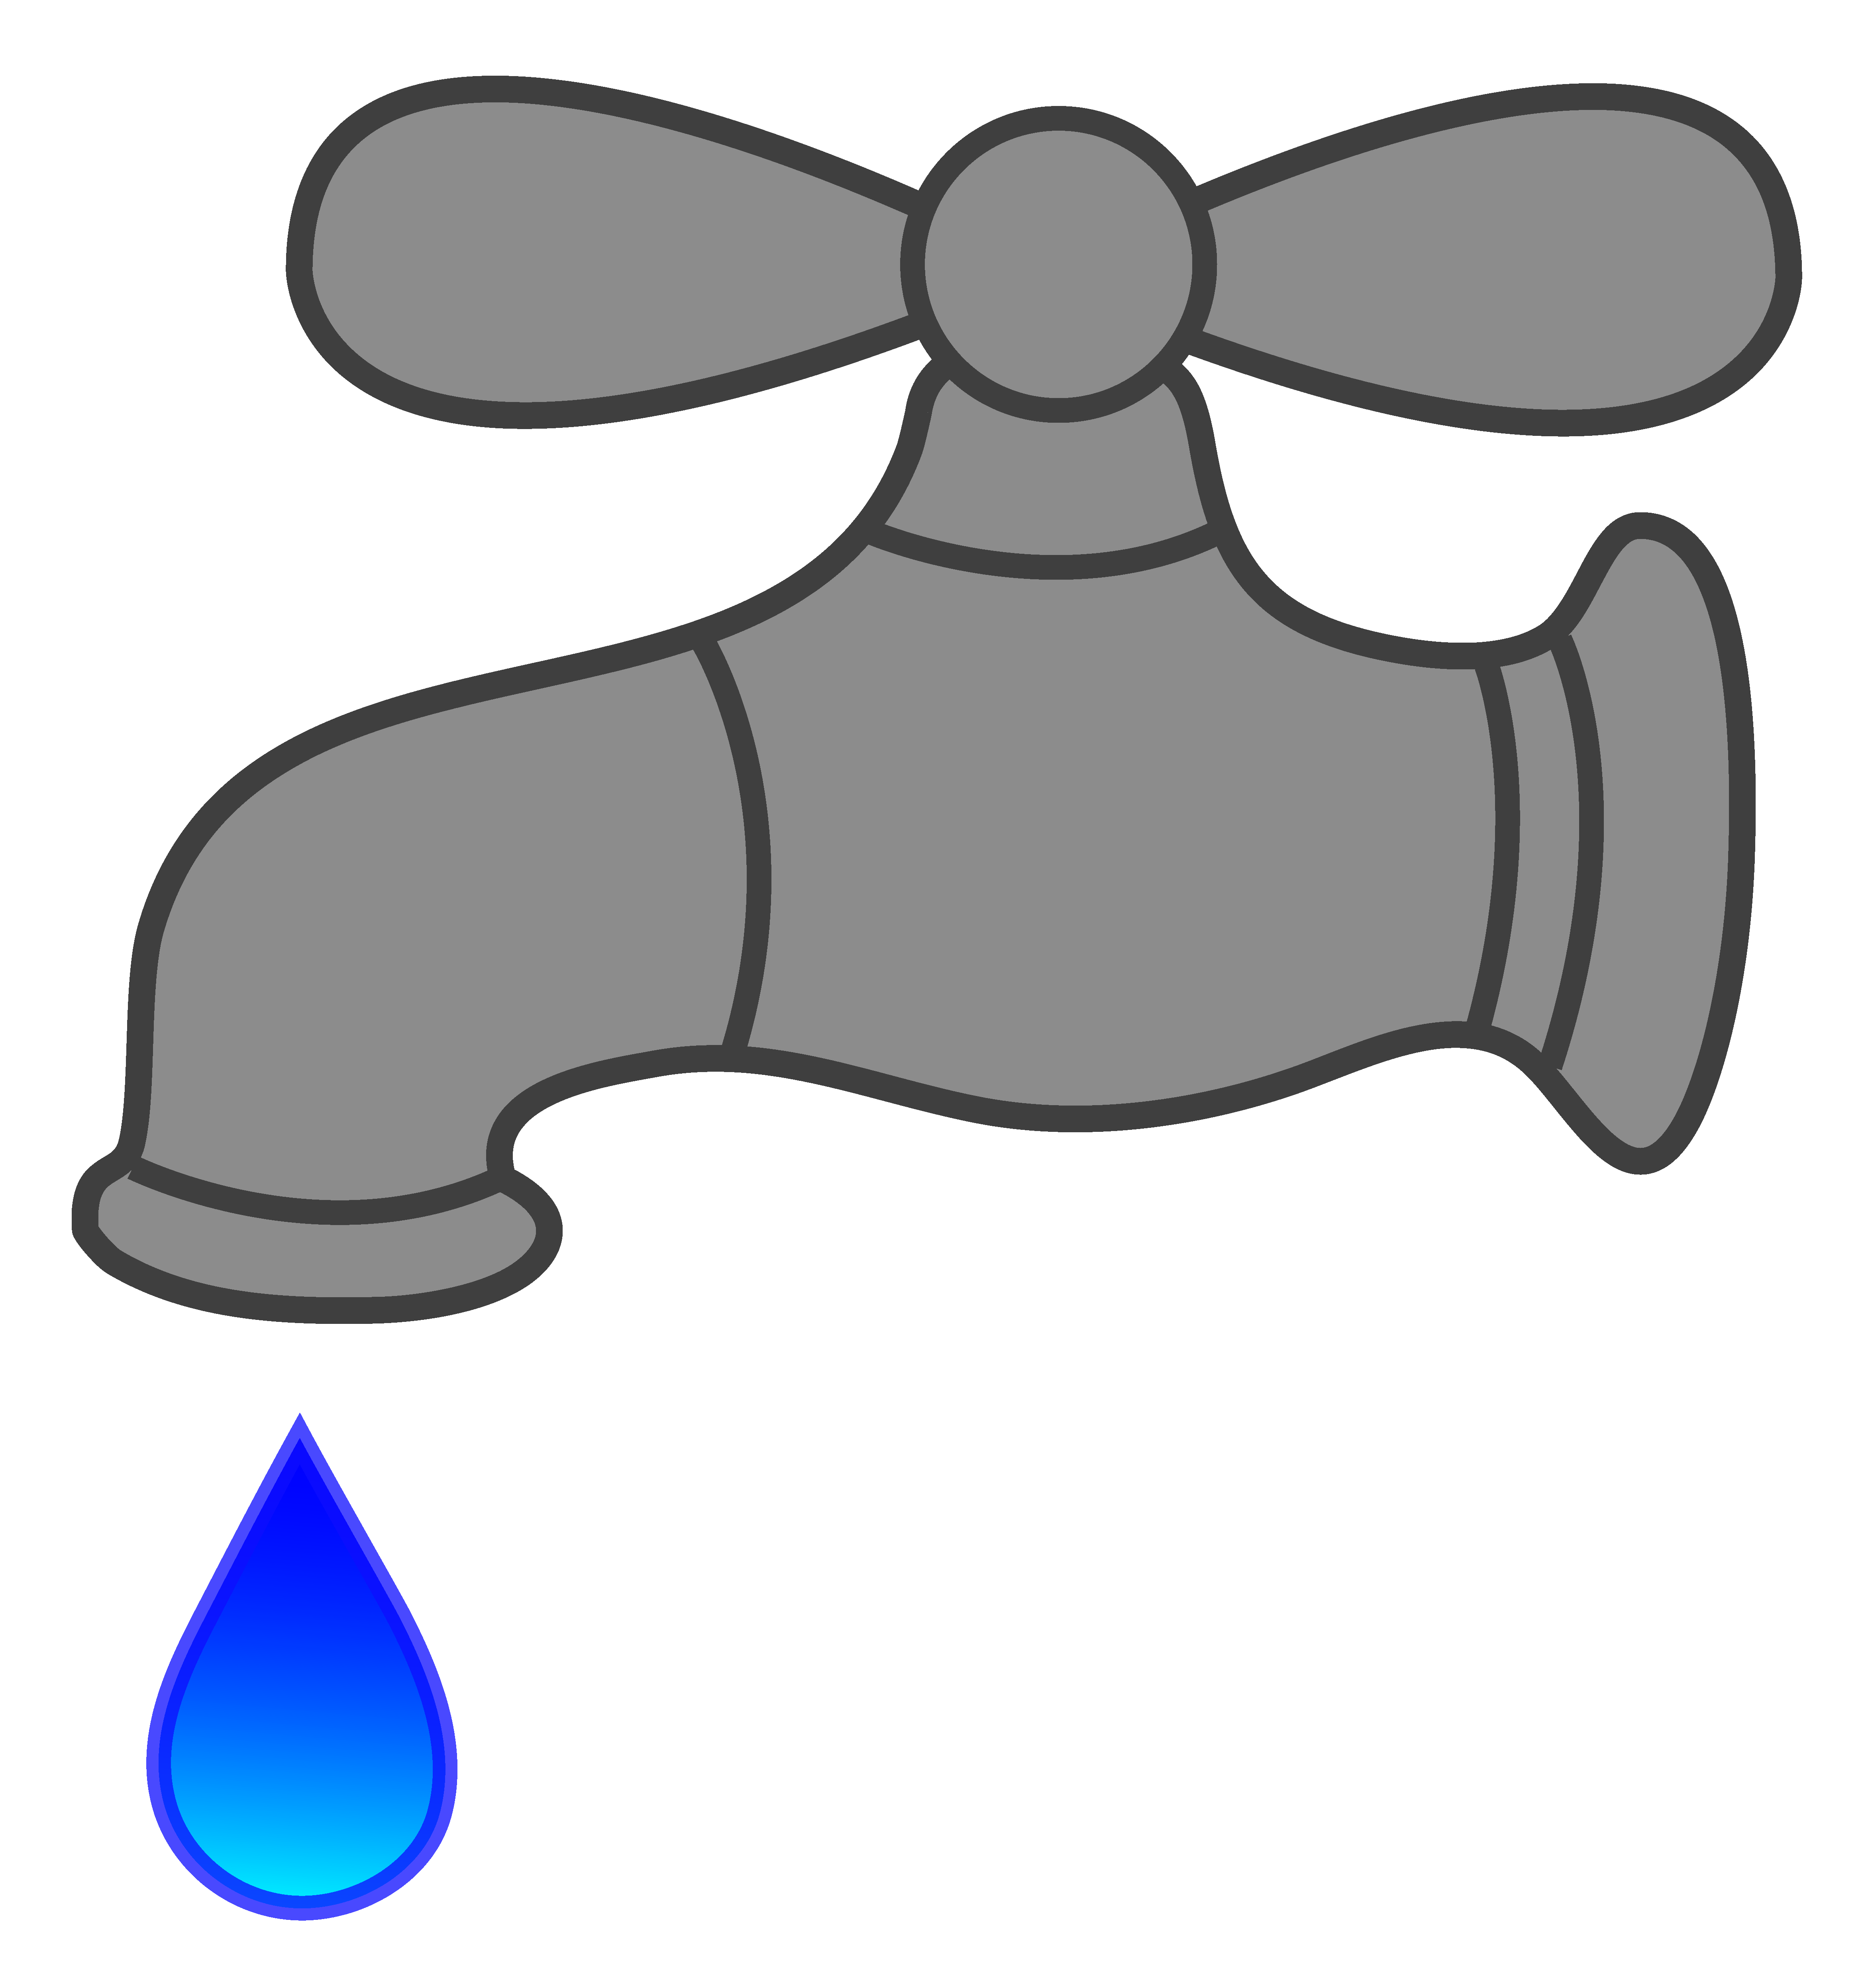 Sink Clip Art - Cliparts.co - 183.9KB